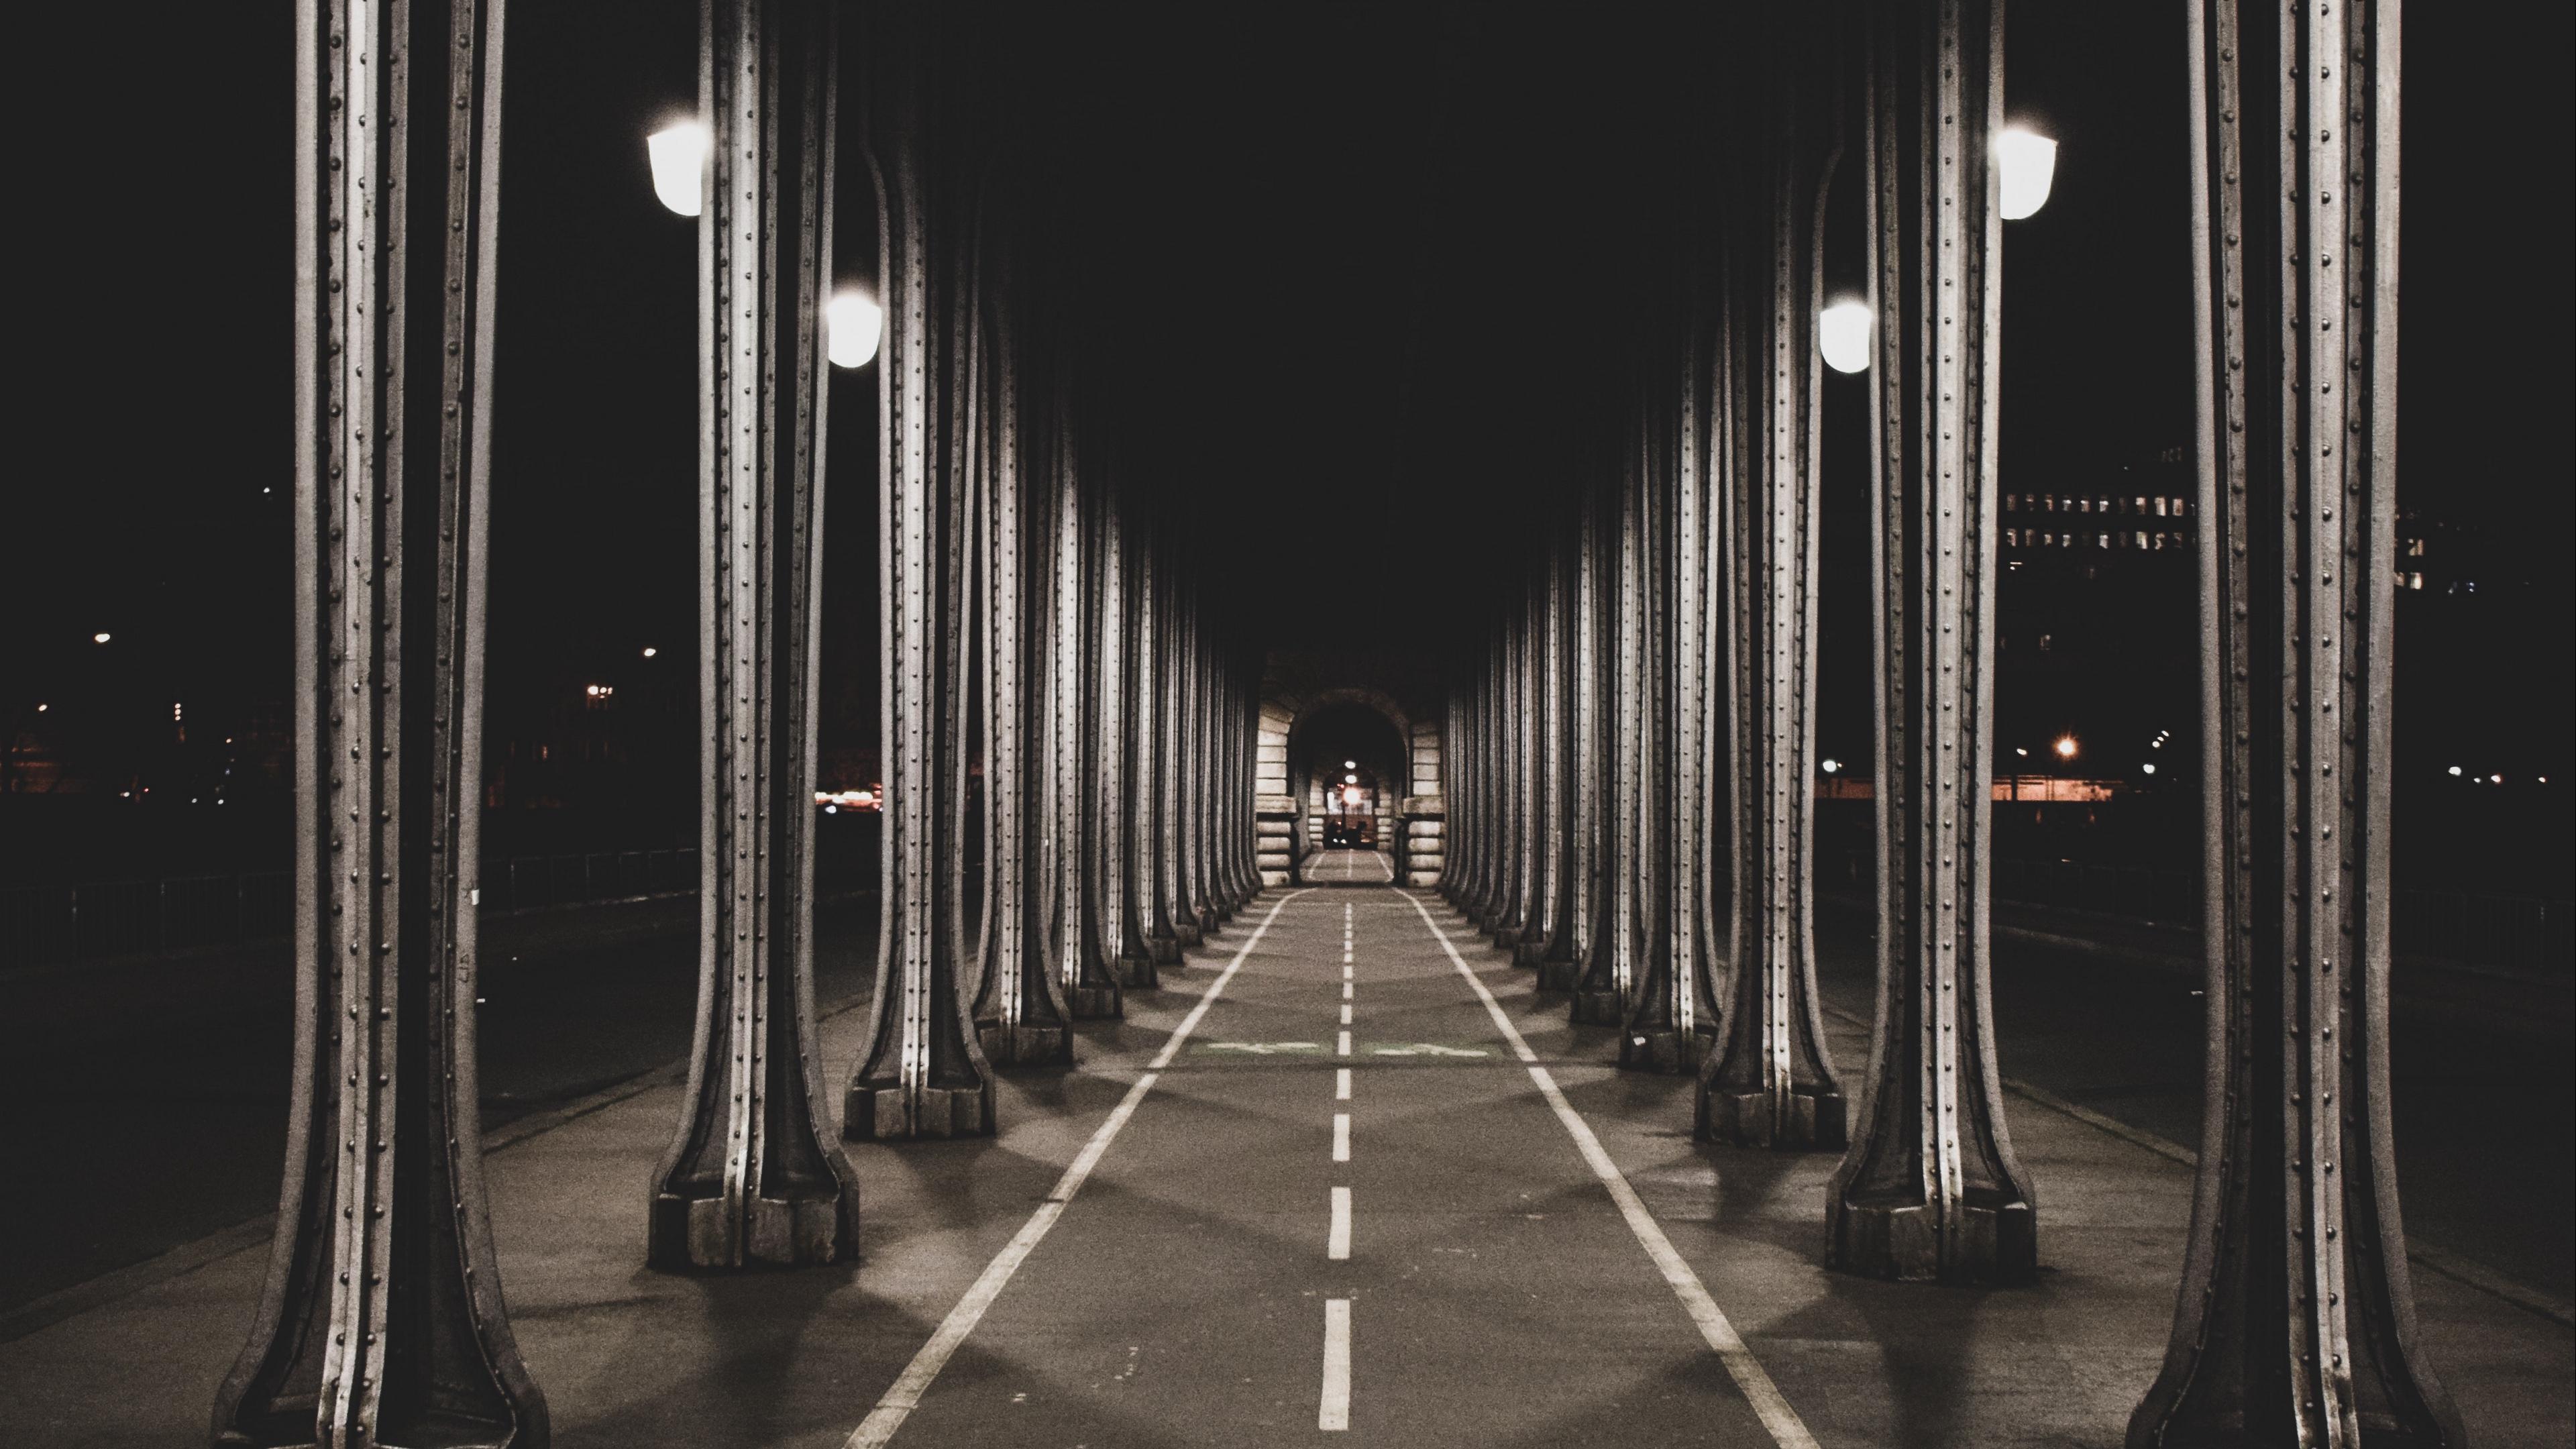 road marking columns night 4k 1538066637 - road, marking, columns, night 4k - Road, marking, columns